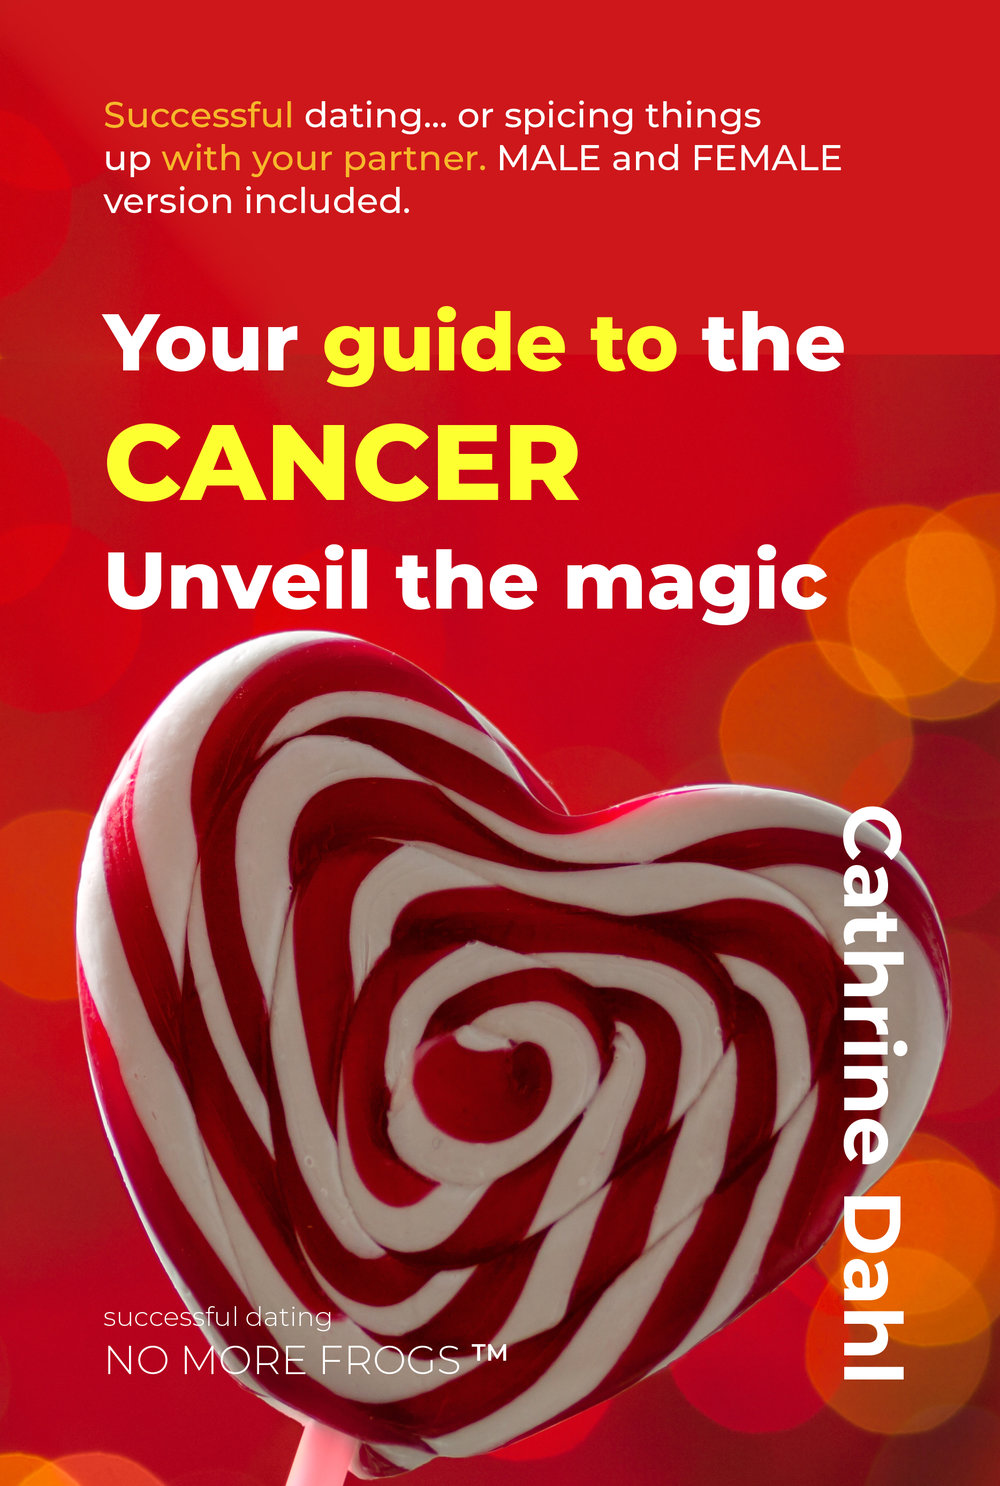 04_cancer_ebook_cover_190126.jpg